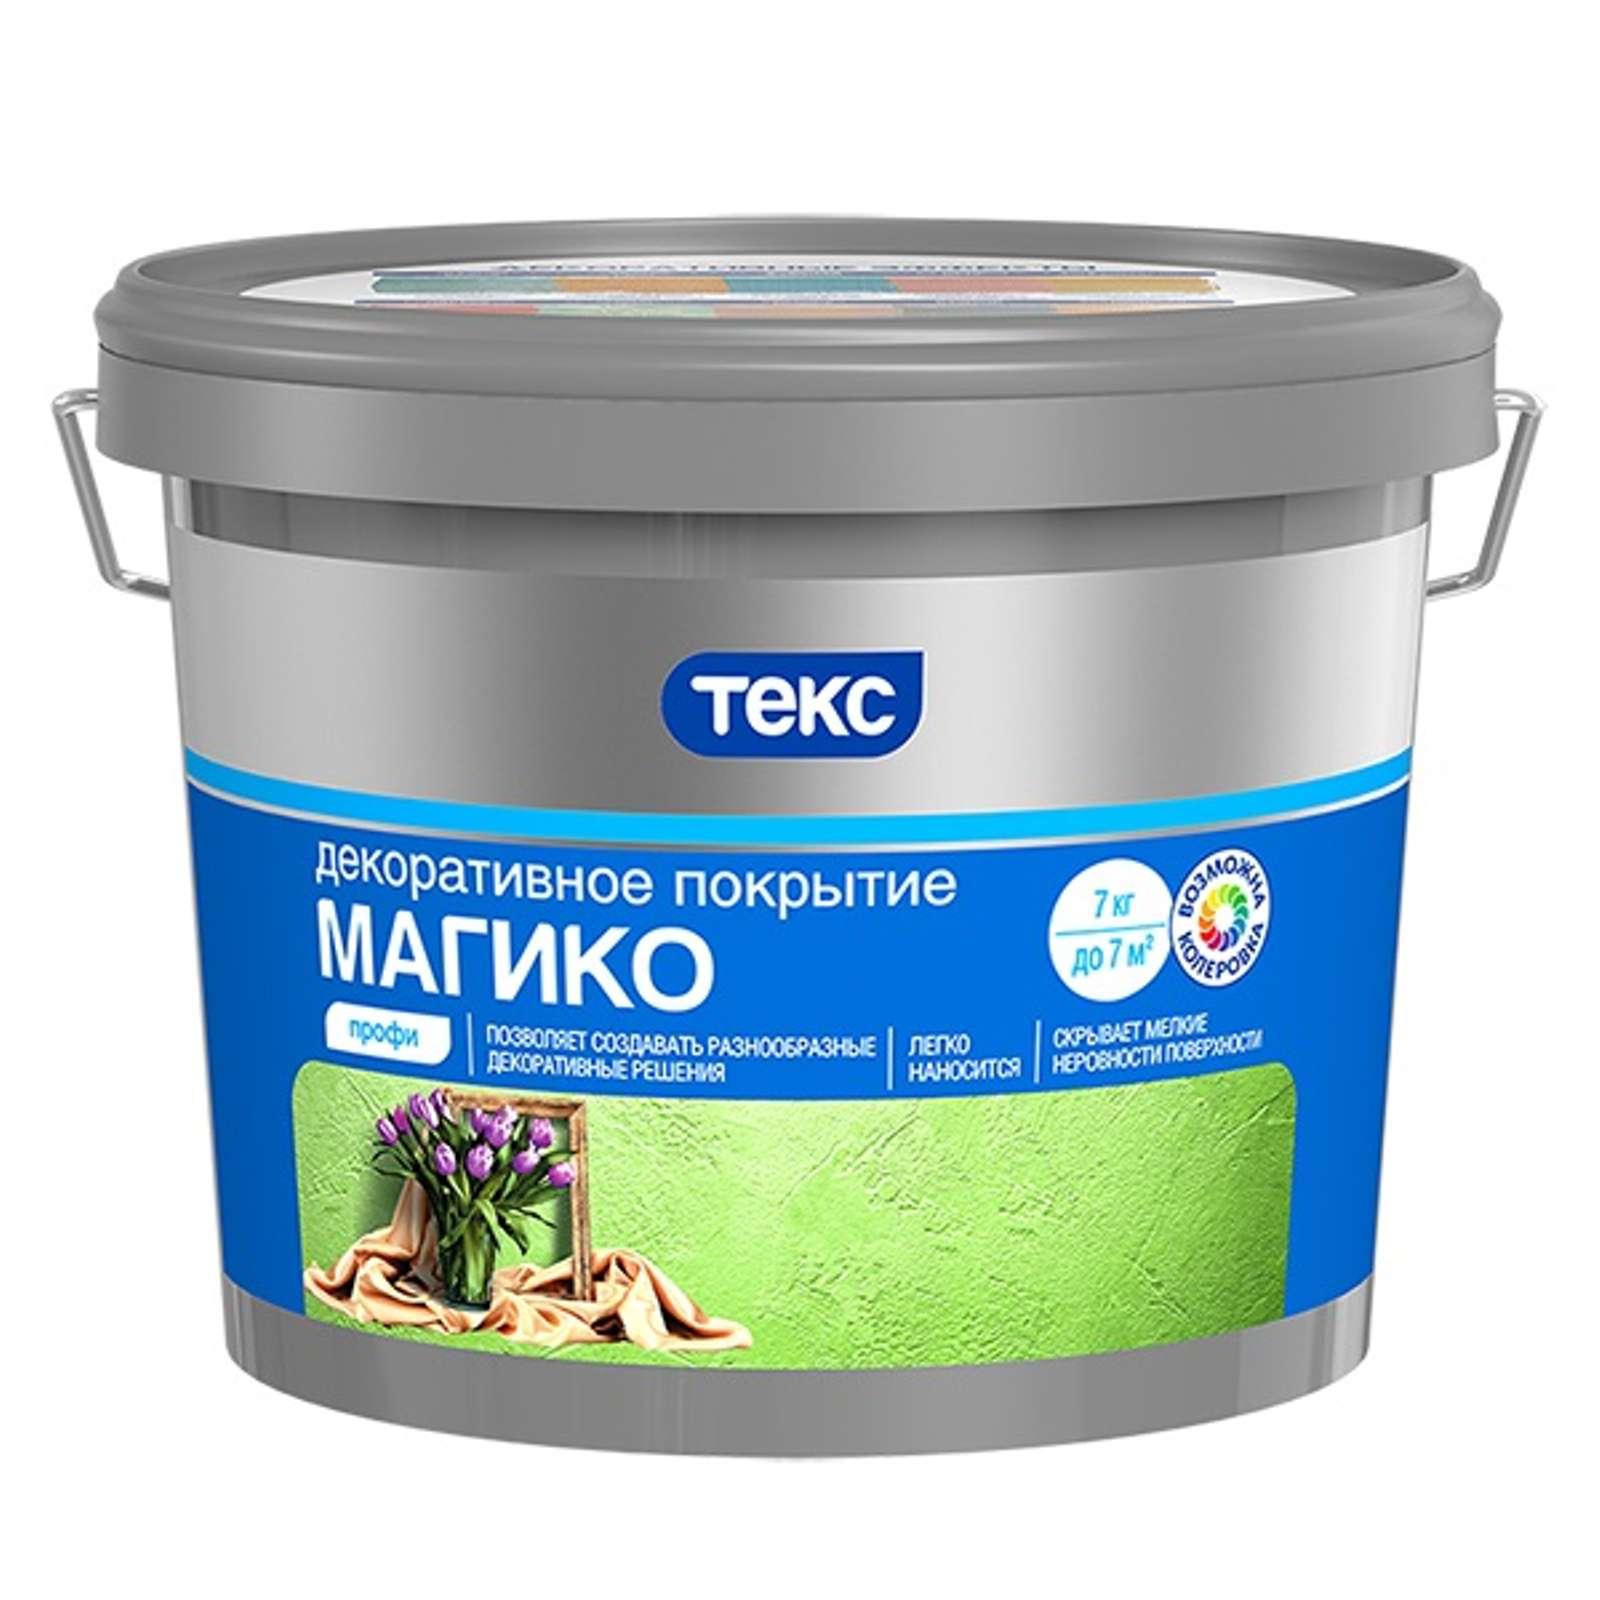 Профи бетон москва подача керамзитобетону